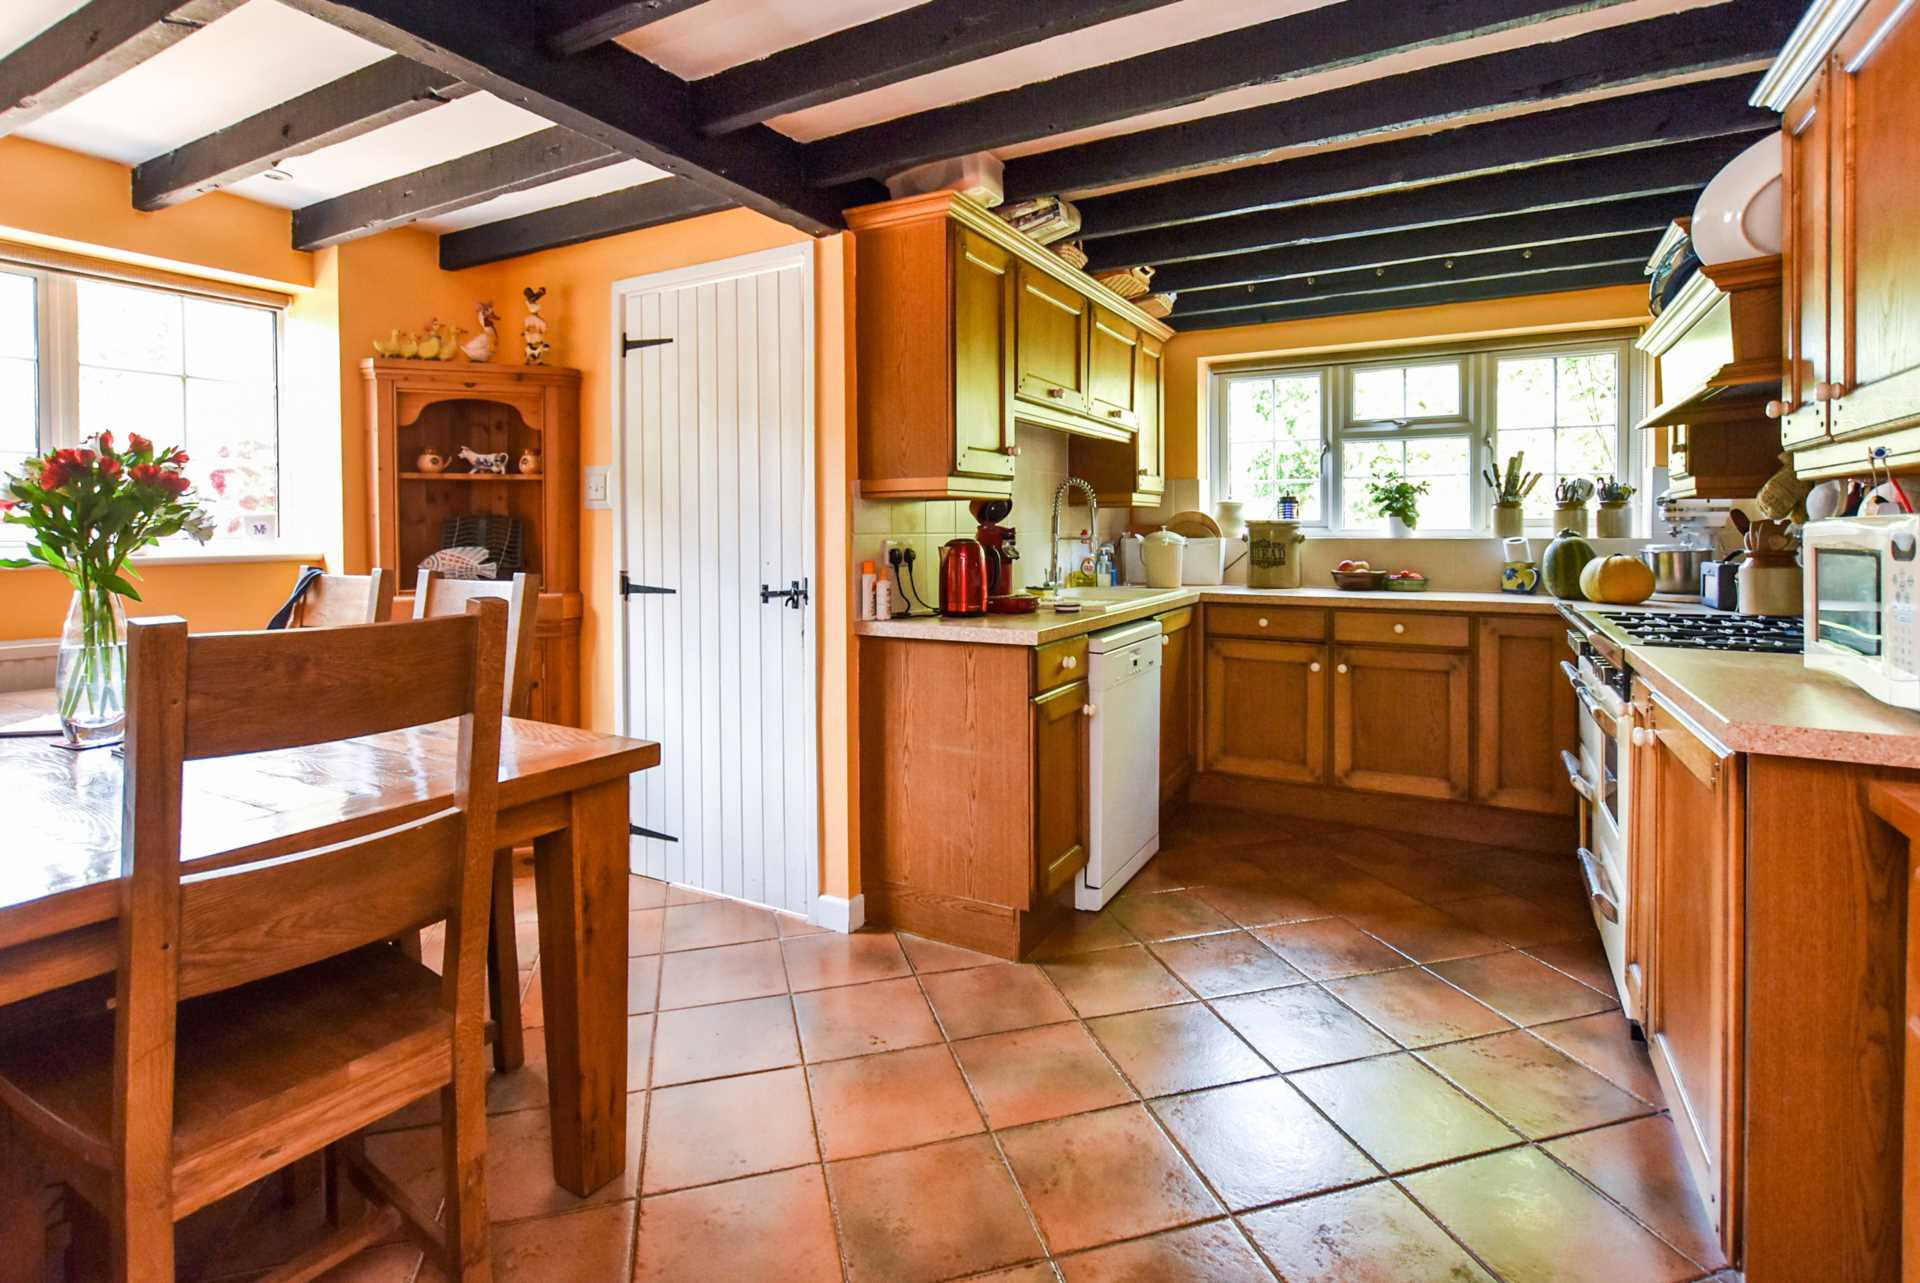 Fullamoor Cottages, Clifton Hampden, Image 3